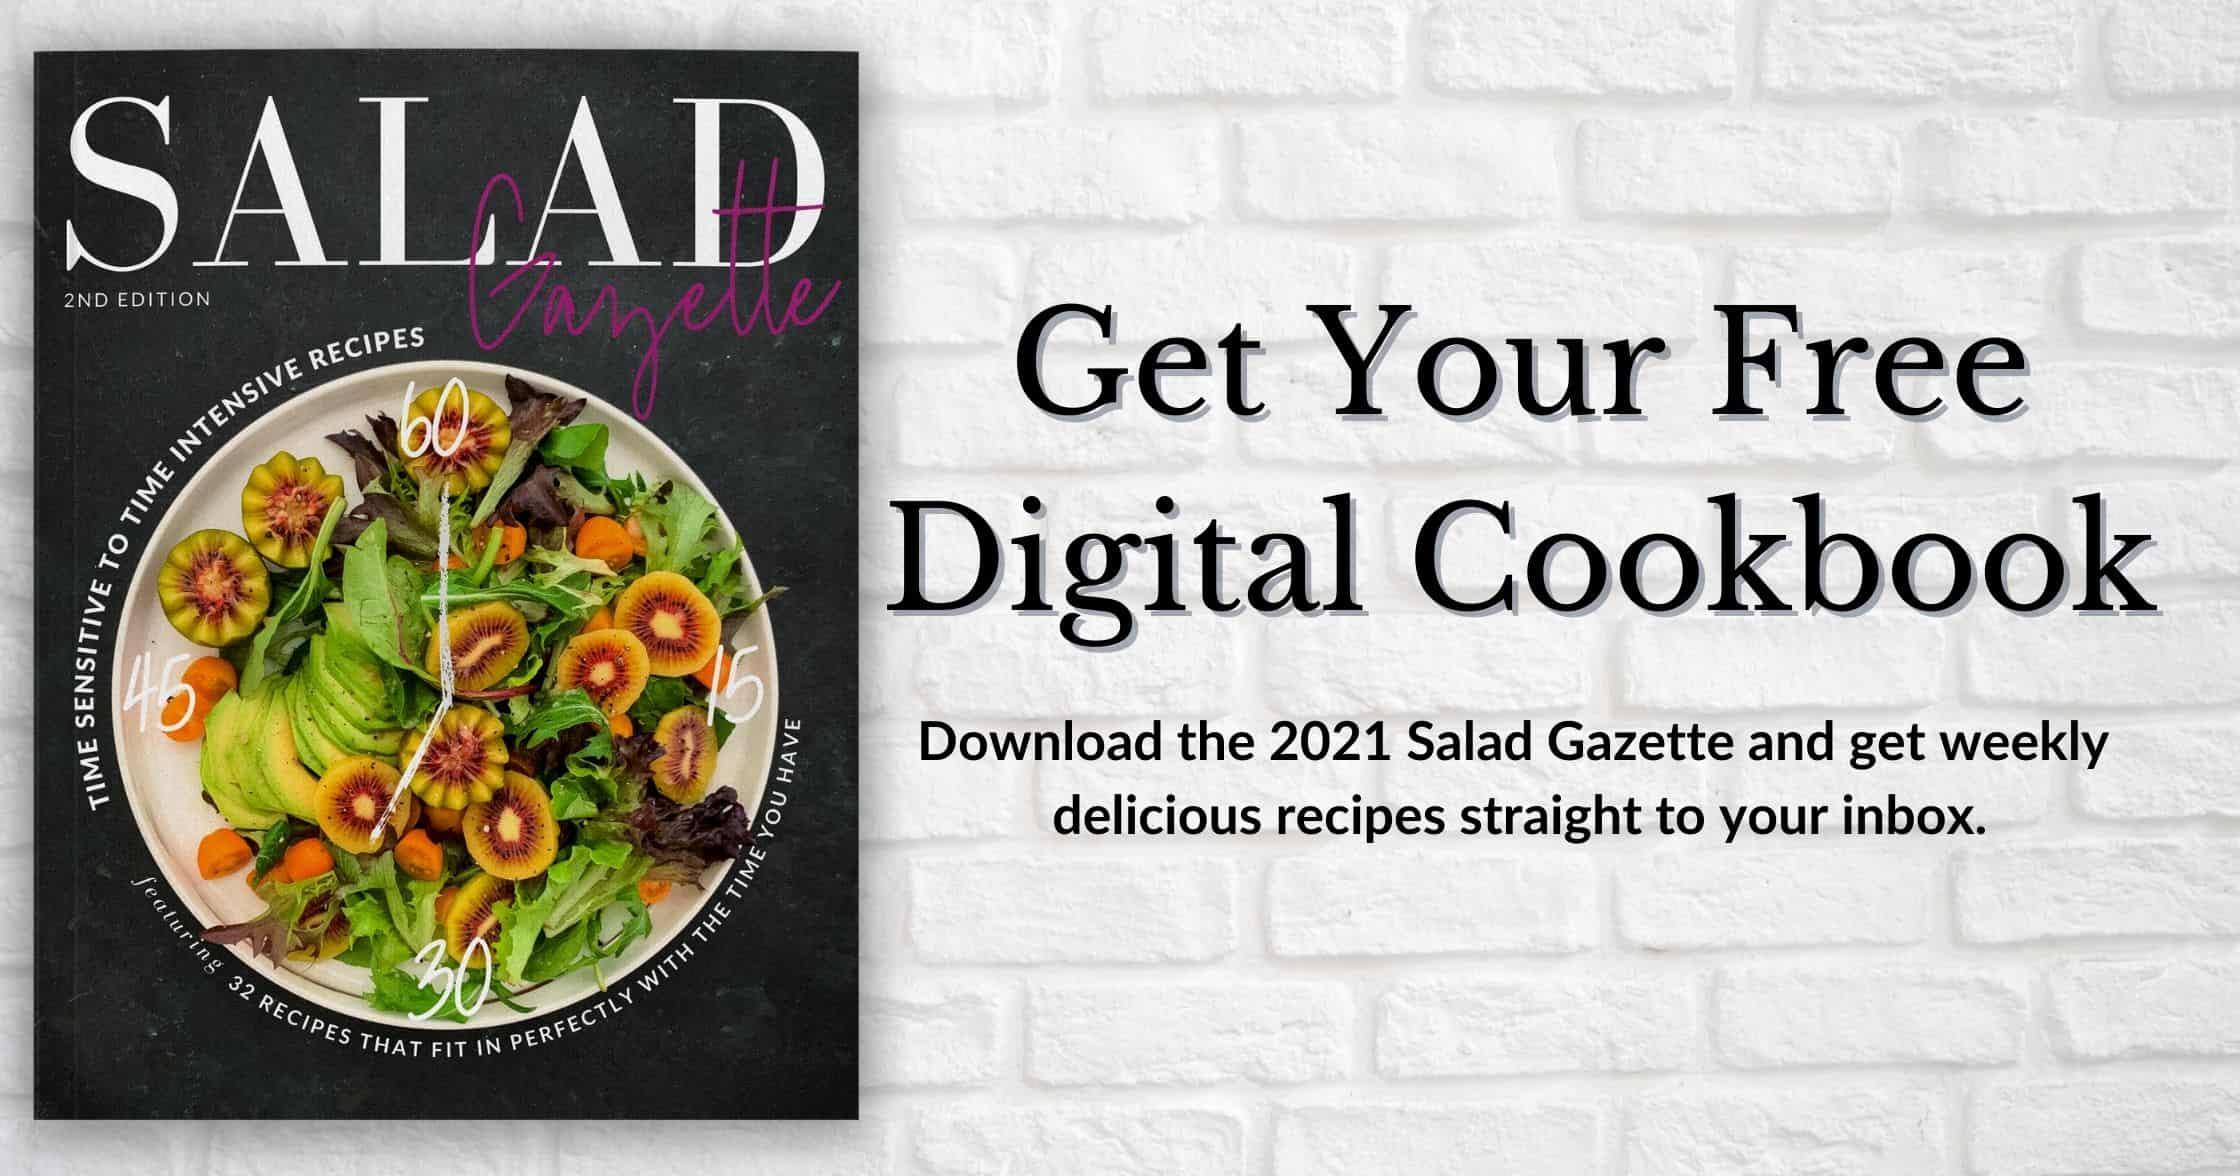 get your free digital cookbook, download